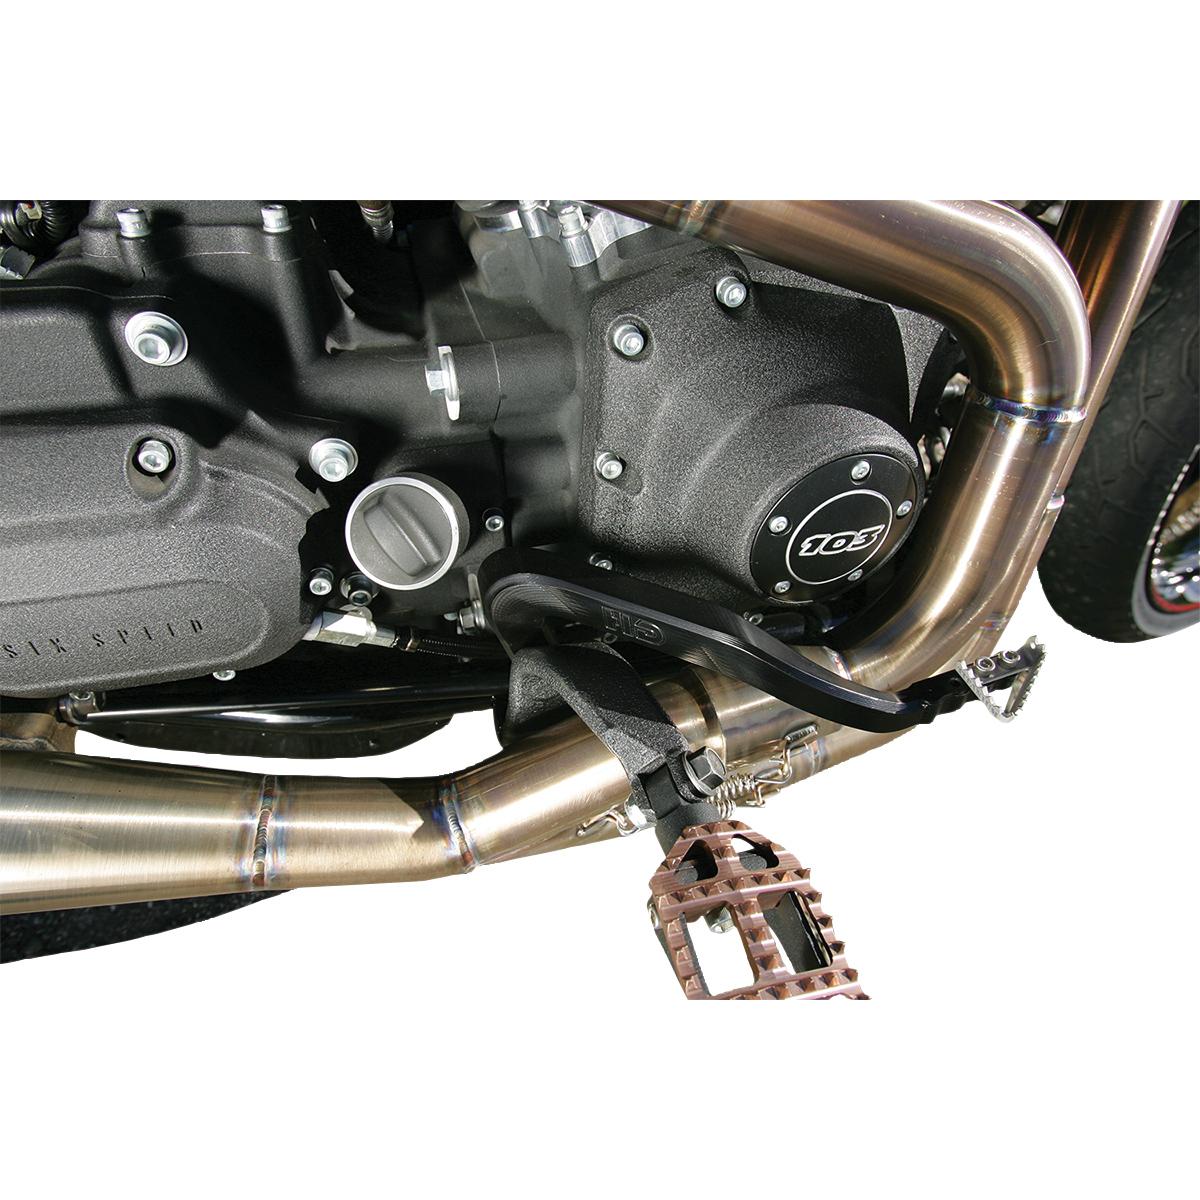 Hammerhead Designs Inc. Black Rear Brake Arm with Silver Fixed Tip